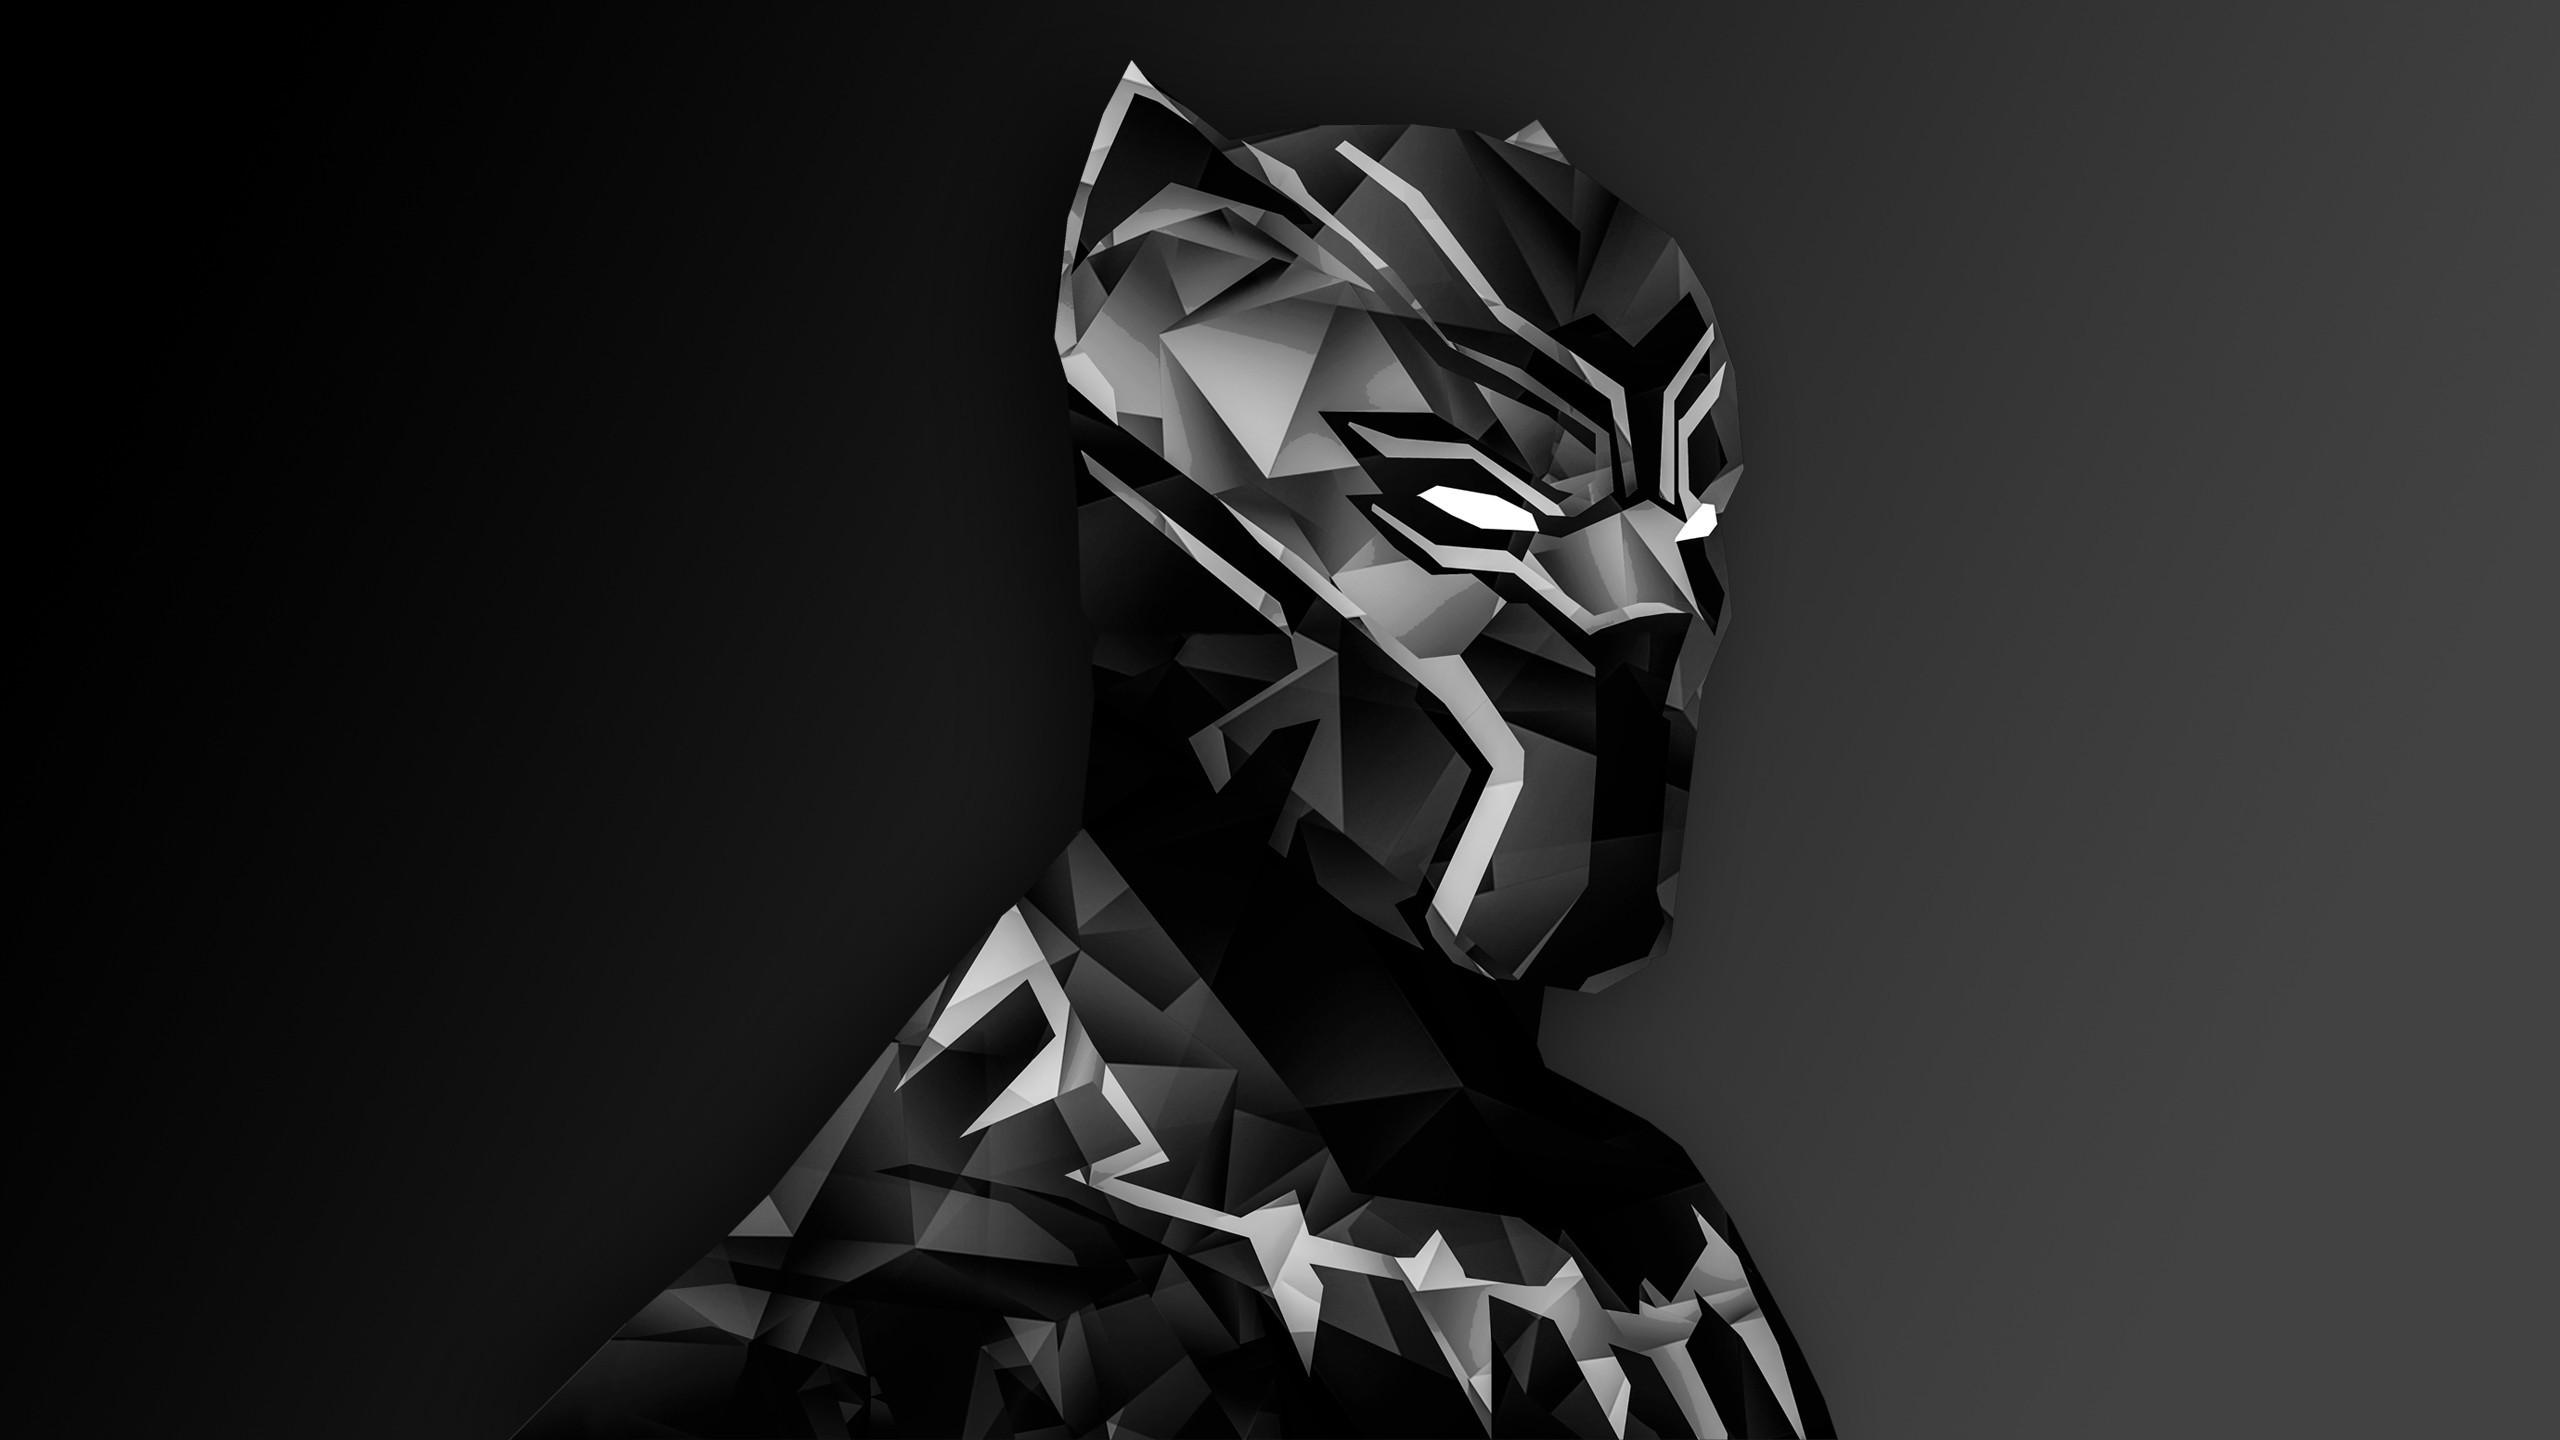 Black Panther Digital Art Wallpaper   Superheroes HD Wallpapers